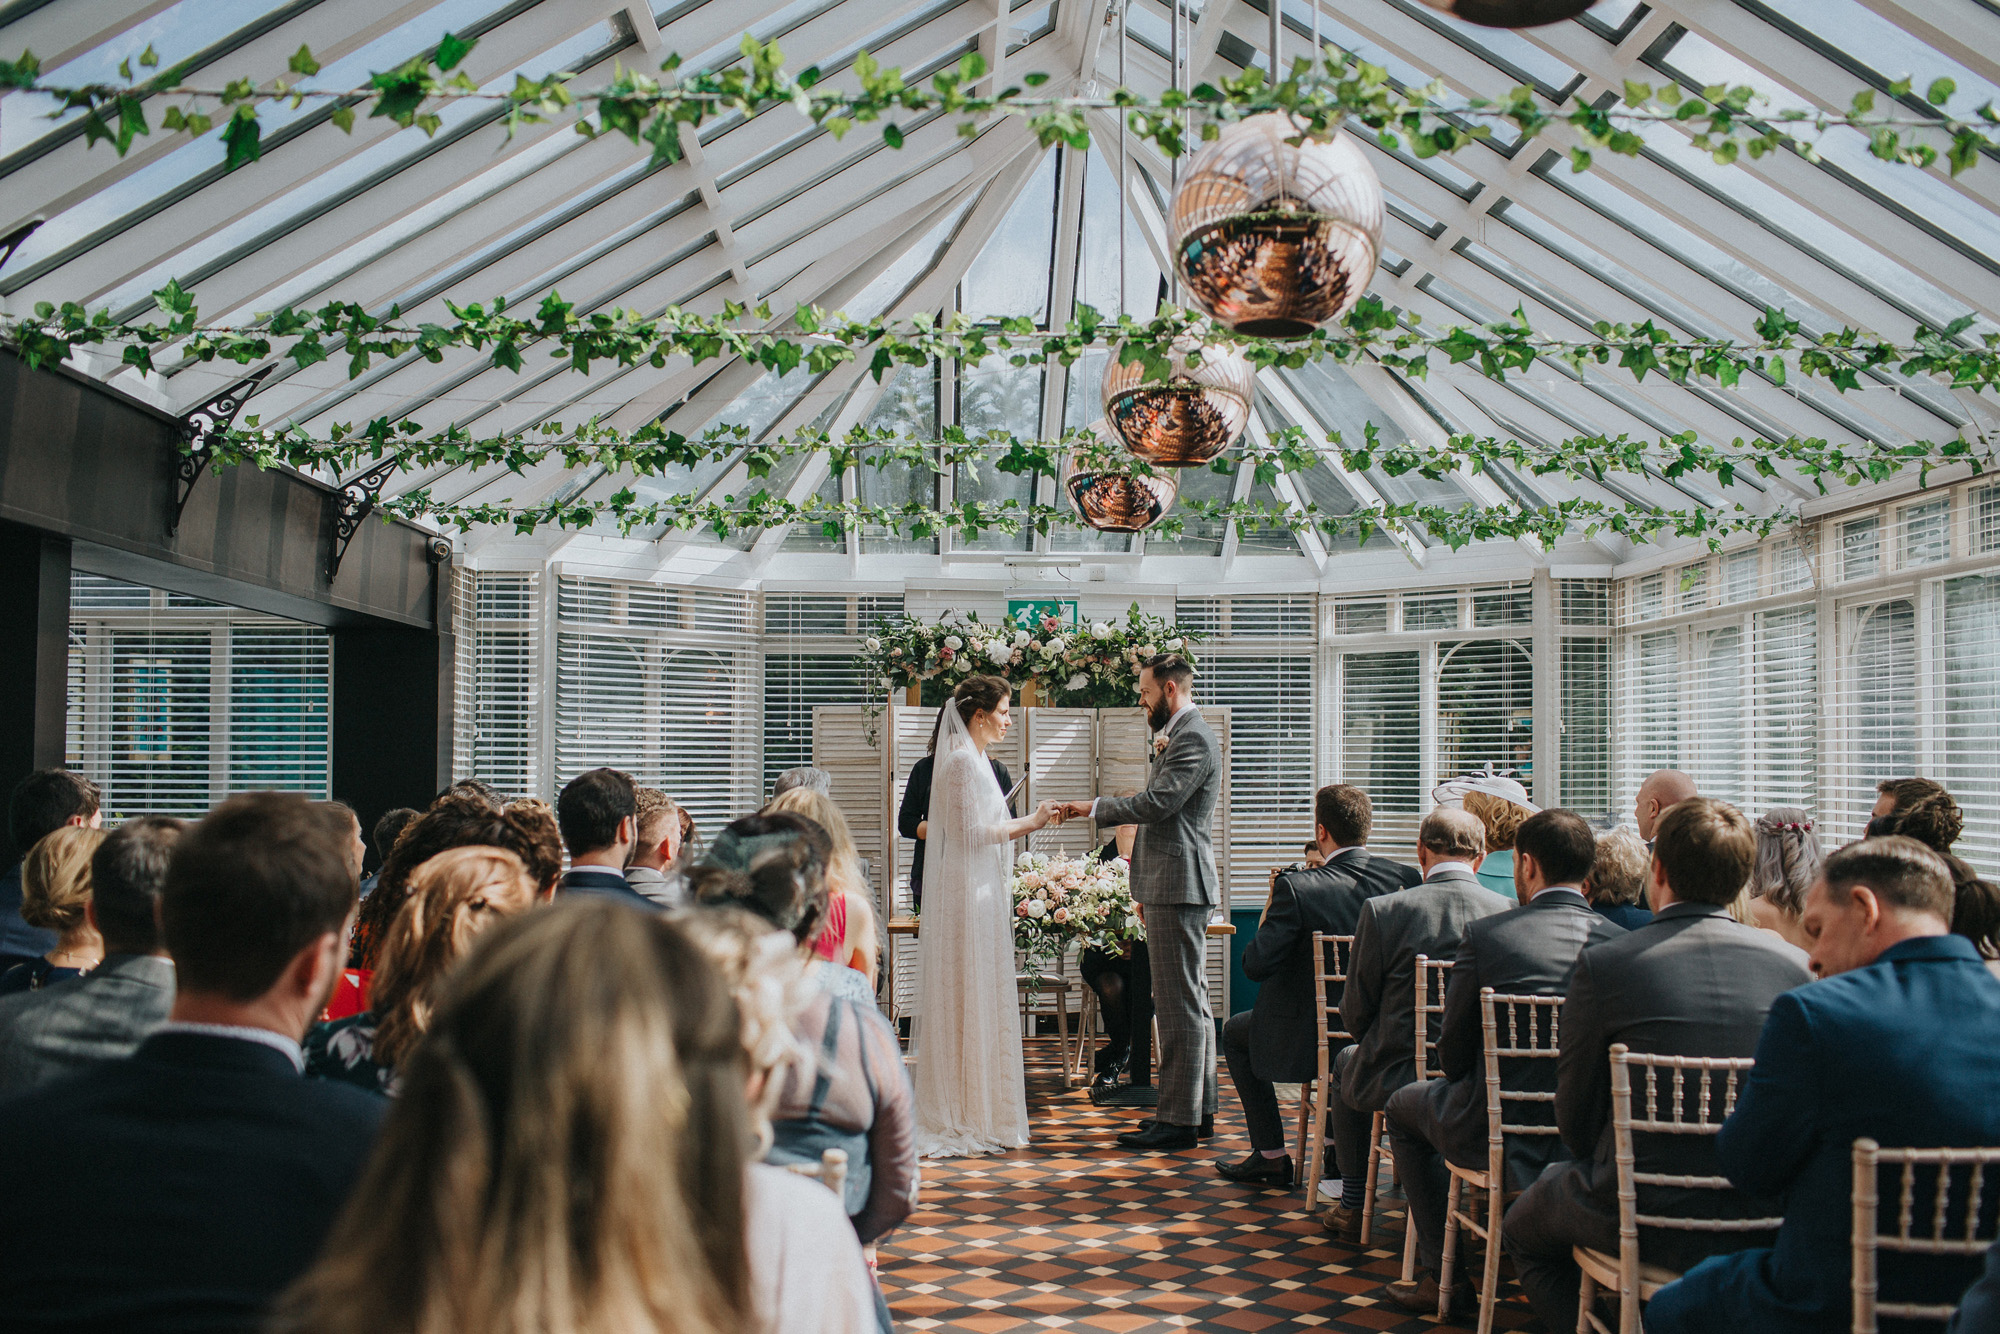 Kate-Beaumont-Lace-Flared-Dahlia-Gown-Leeds-Wedding-Bloom-Weddings-23.jpg